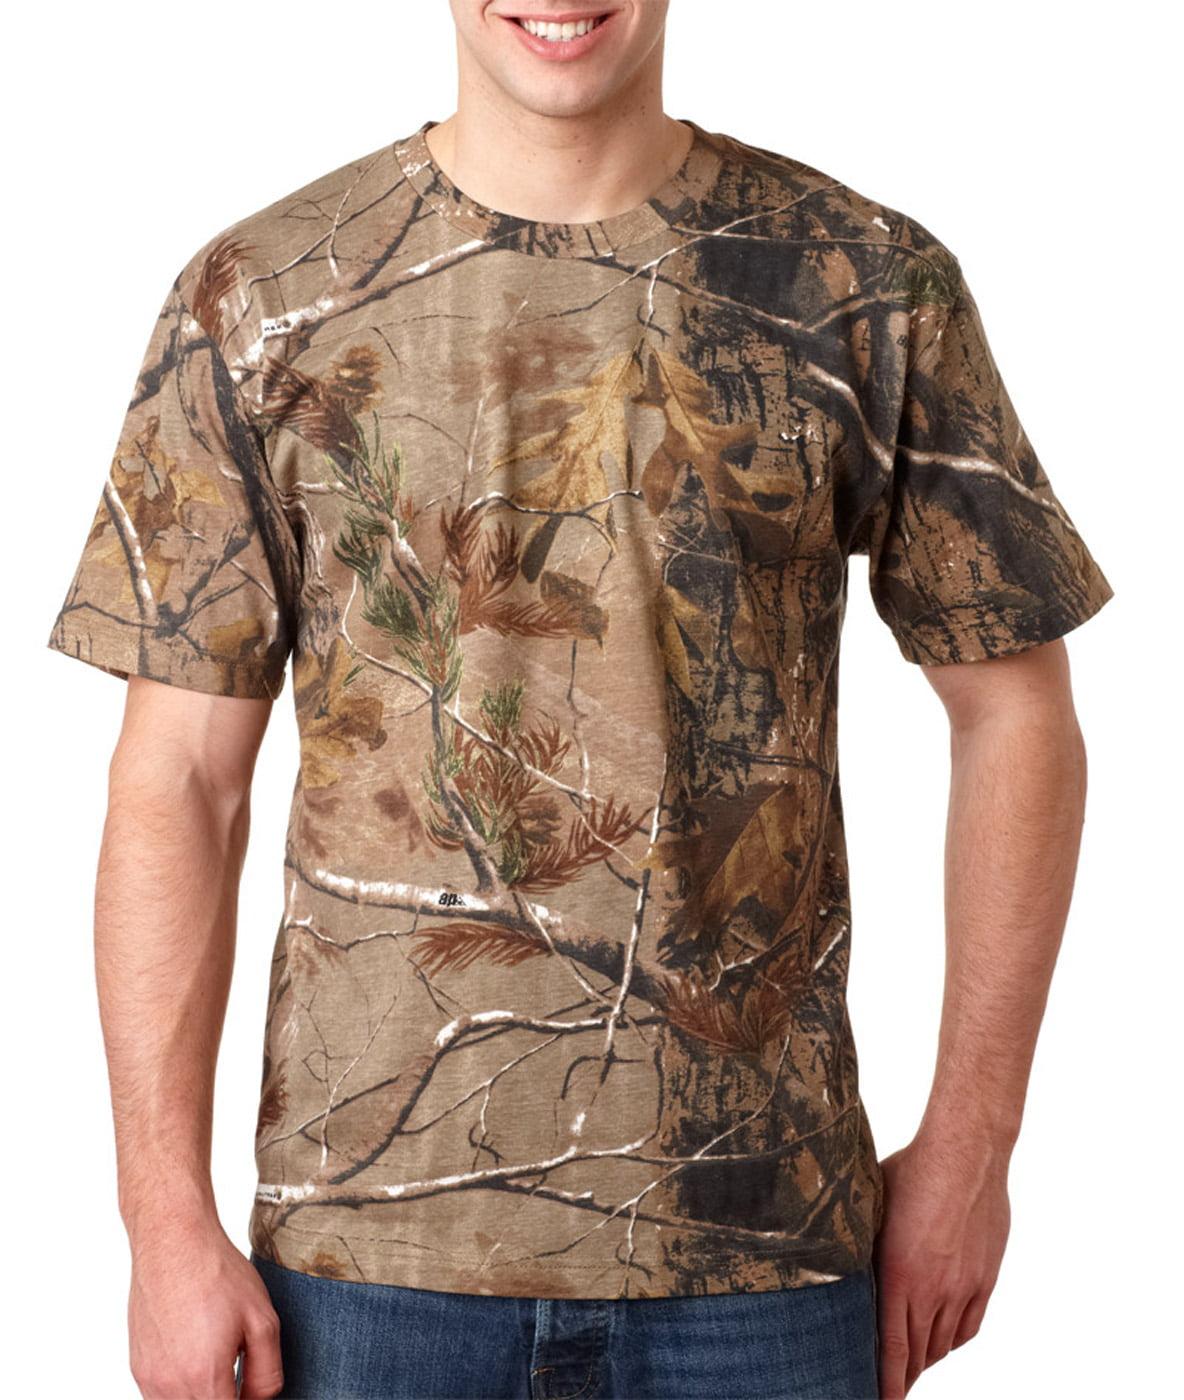 Code V Men's Realtree Camo T-Shirt by Code V